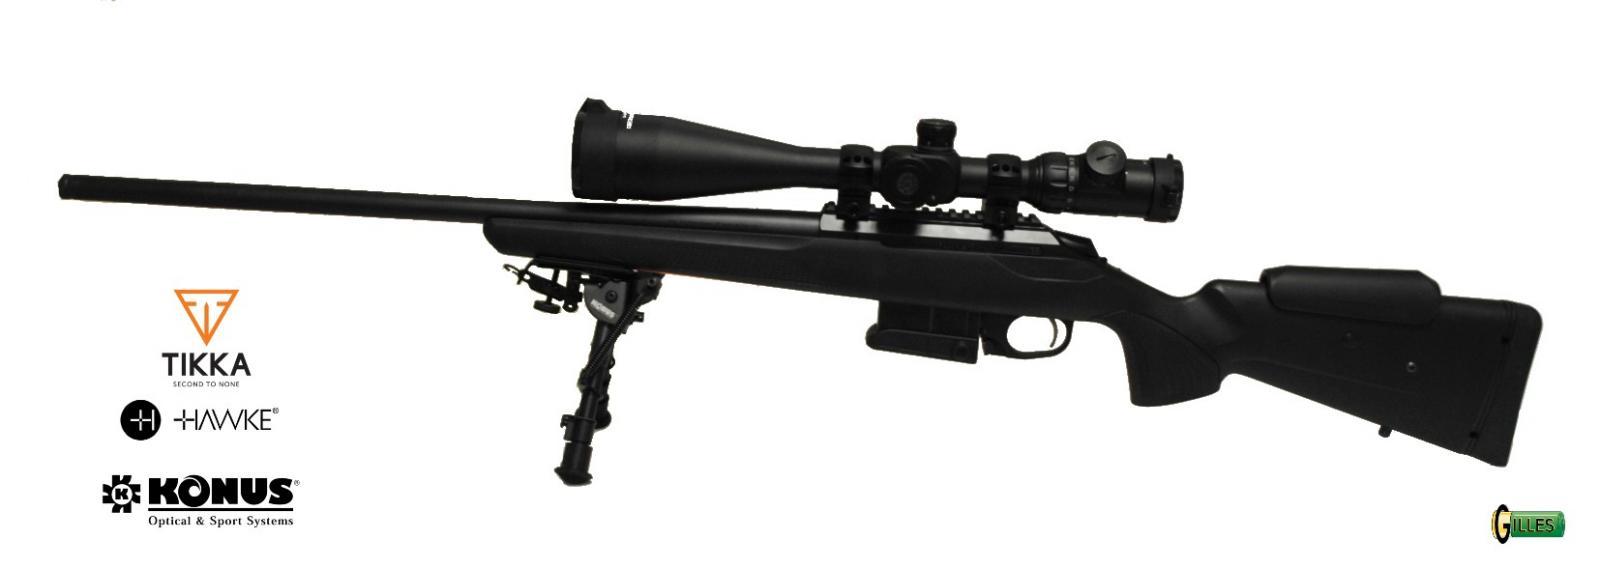 Pack Carabine TIKKA T3X COMPACT TACTICAL RIFLE + Lunette KONUS 8-32x56 + Bipied